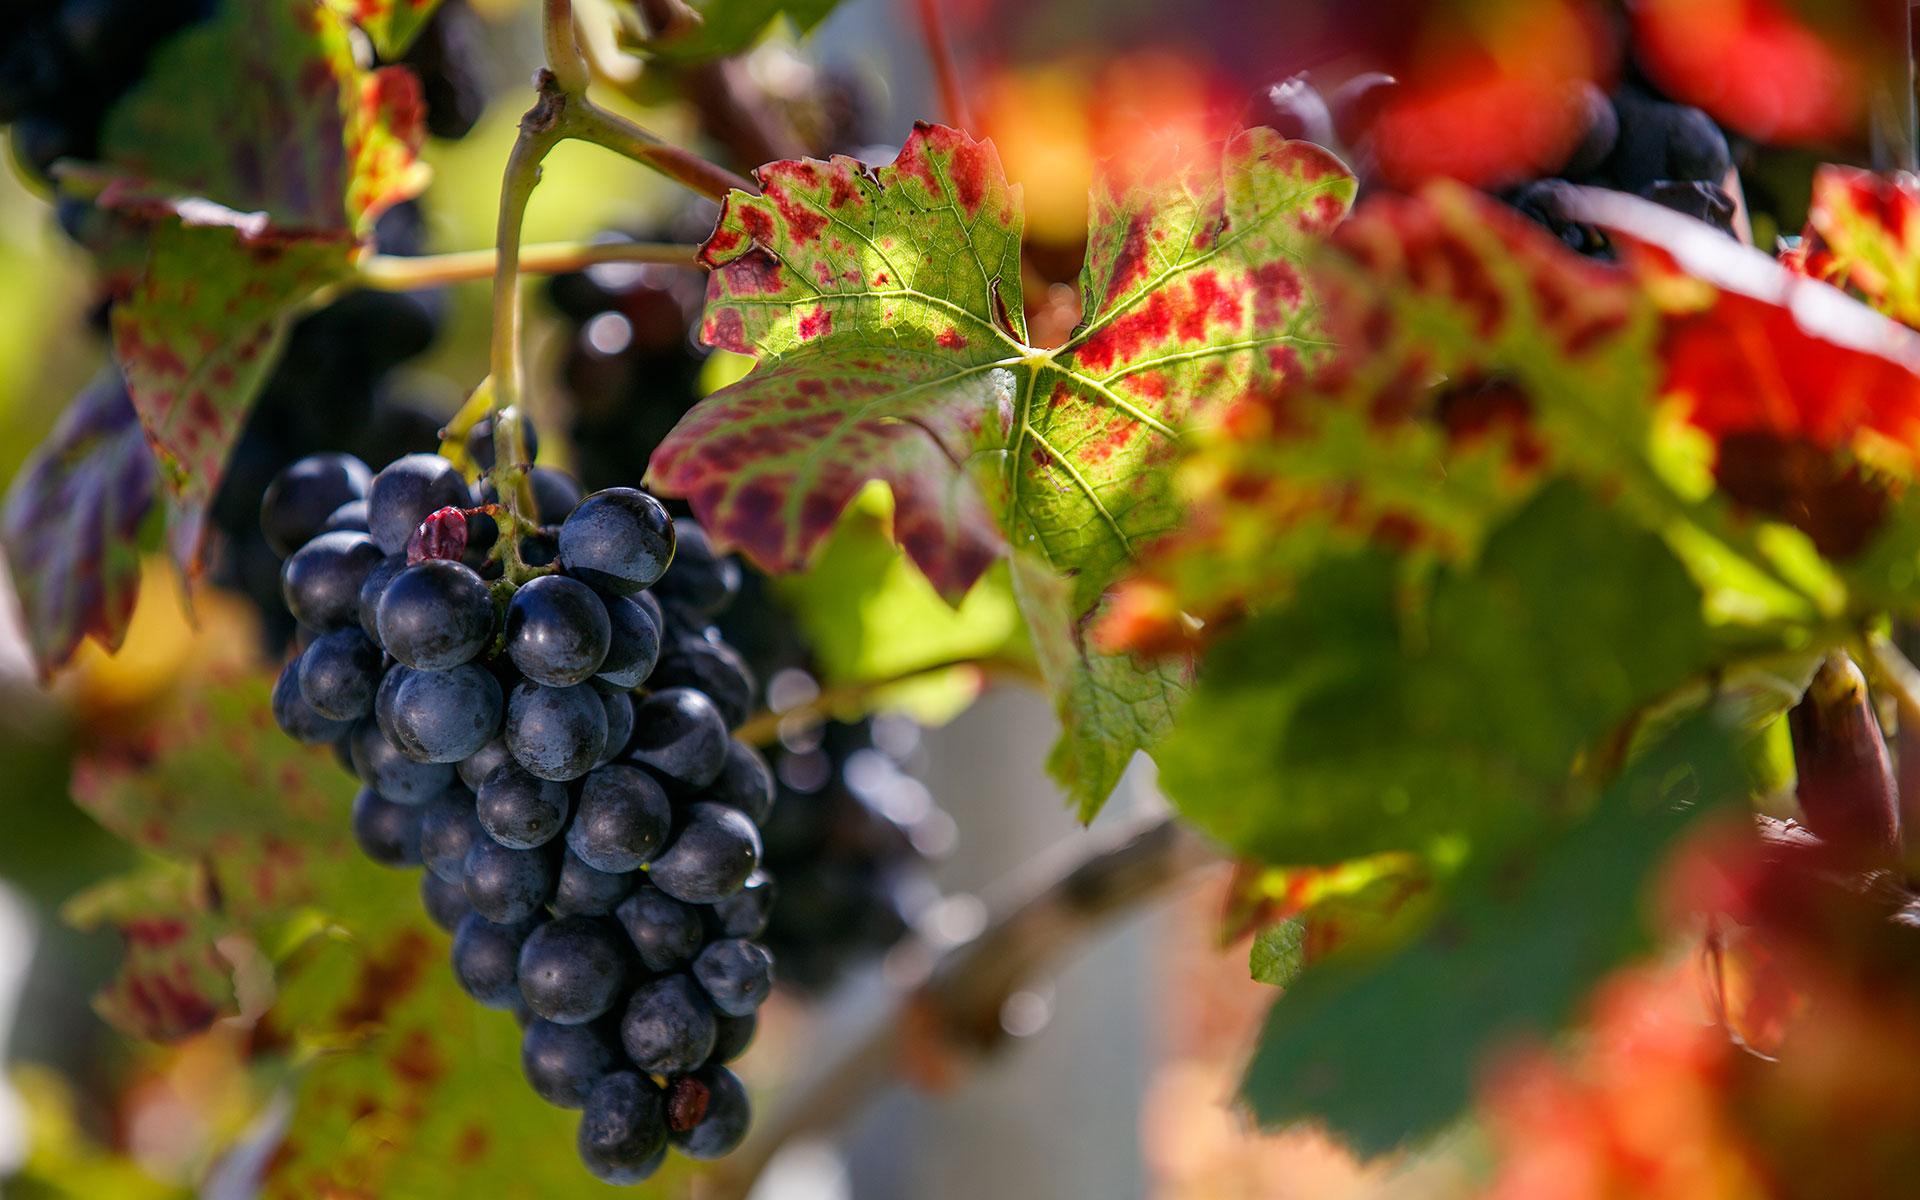 ozmec_vineyard_maro_wine_mursa_m_studio_ma-ma-marinsek_20_5